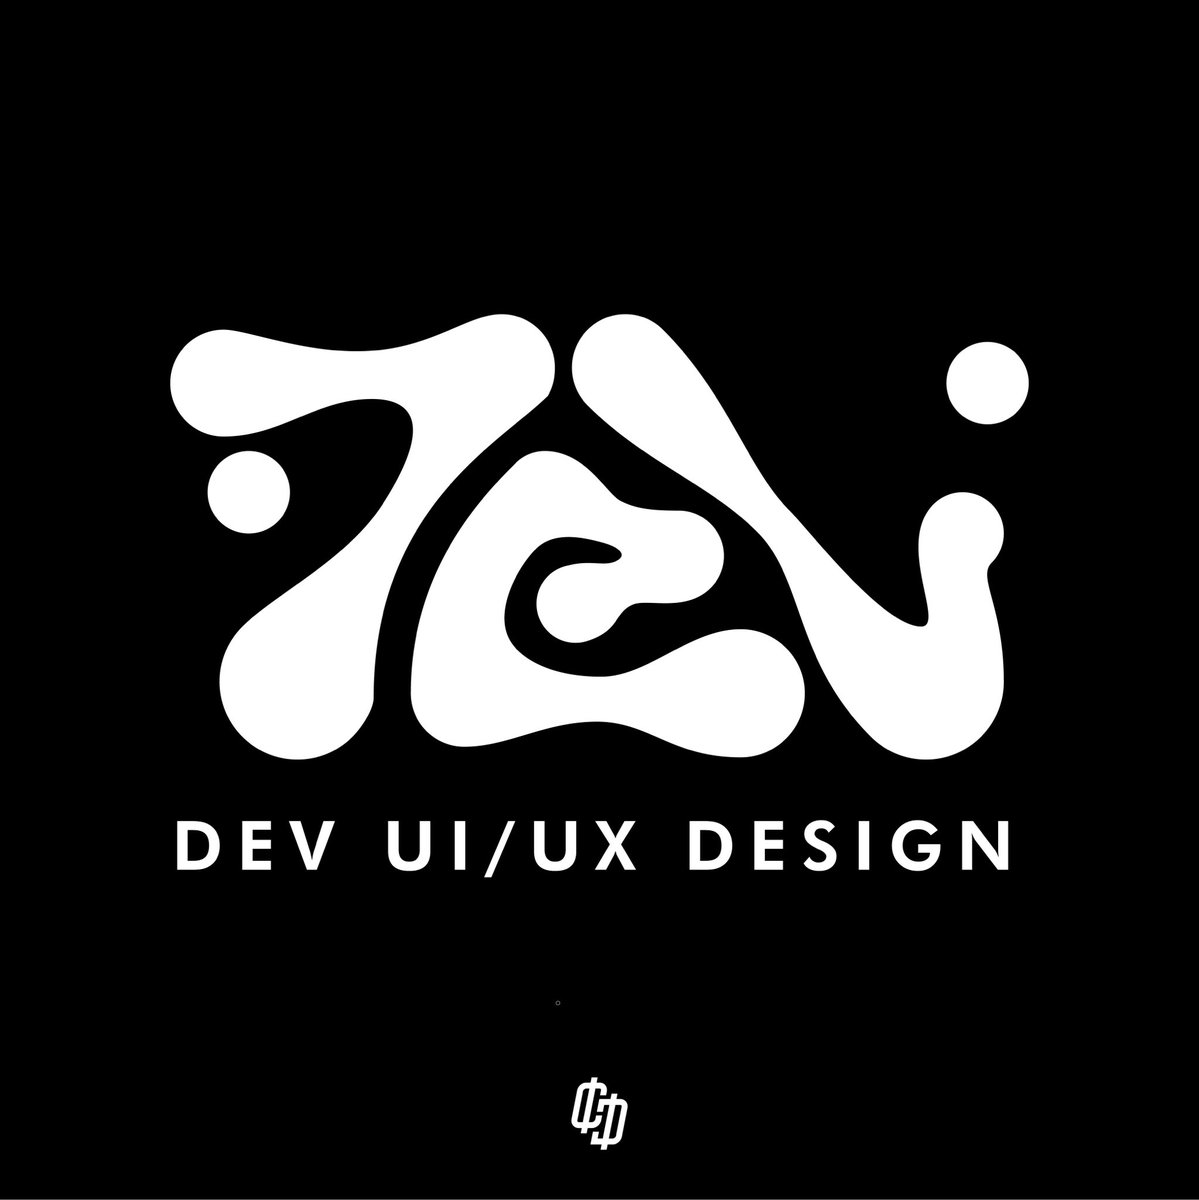 DEV UI/UX Design Logo Options  #CastroDesign #White #Black #DEV #Development #Logos #GraphicDesign #GFX #AdobeIllustrator #Ui #Art #Ux #UIDesign #UXDesign #Organic #Confinement #LogoDesigner #Entrepreneur #EntrepreneurLife #Entrepreneurship #EntrepreneurMindset #Mockup #Skew